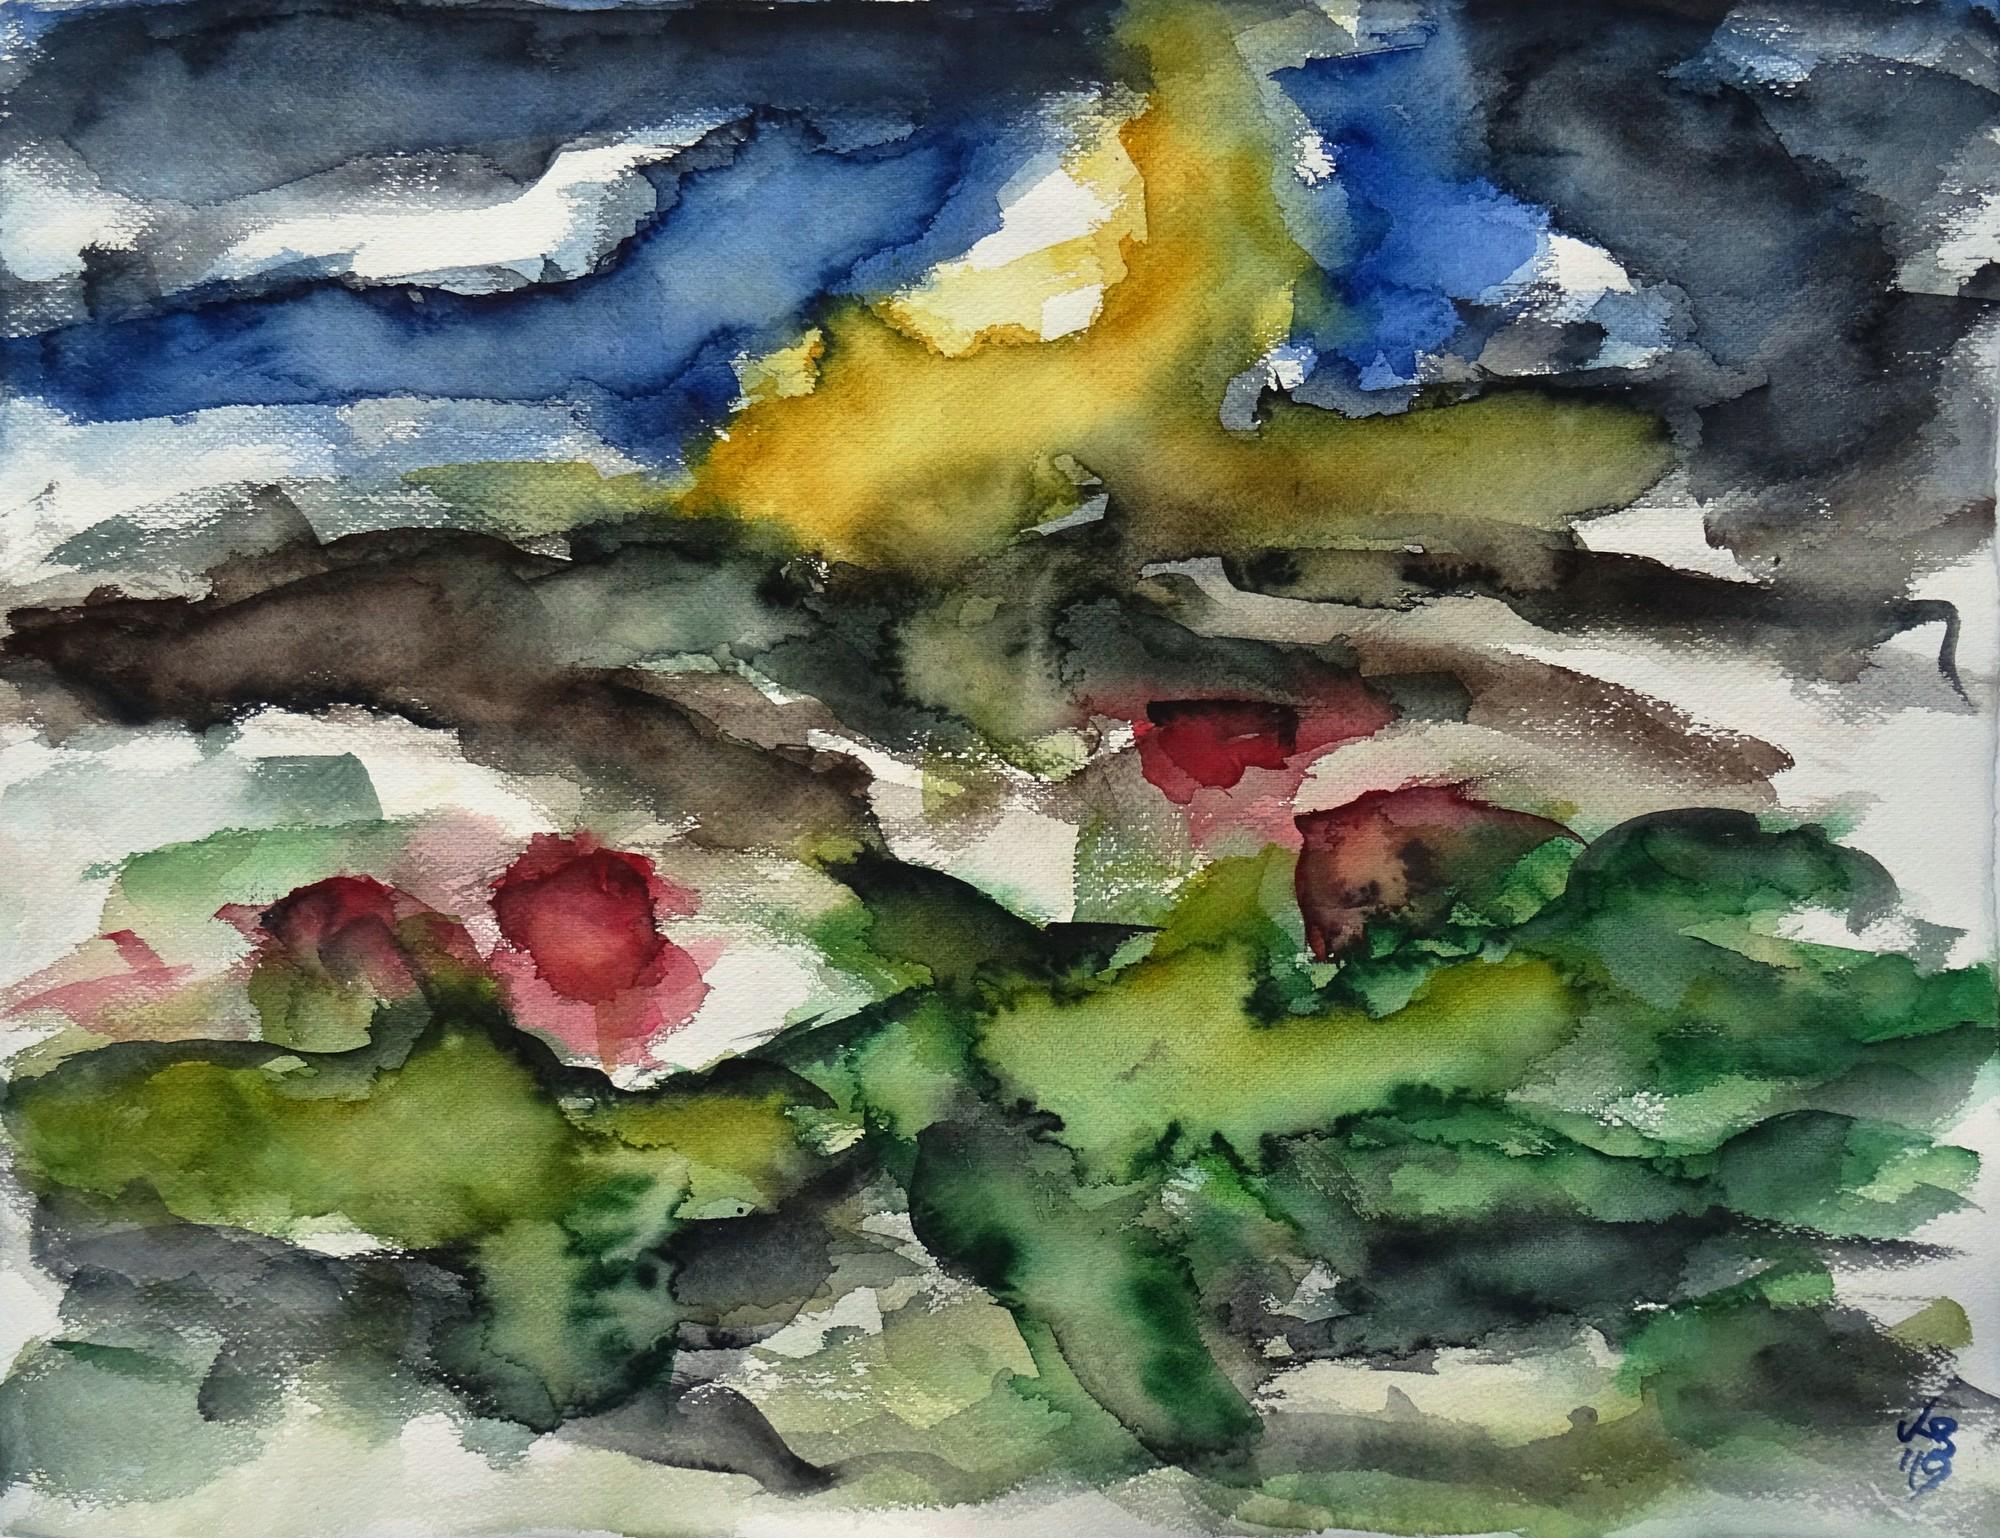 Nordhessen 01, Watercolour 65 x 50 cm, © 2019 by Klaus Bölling